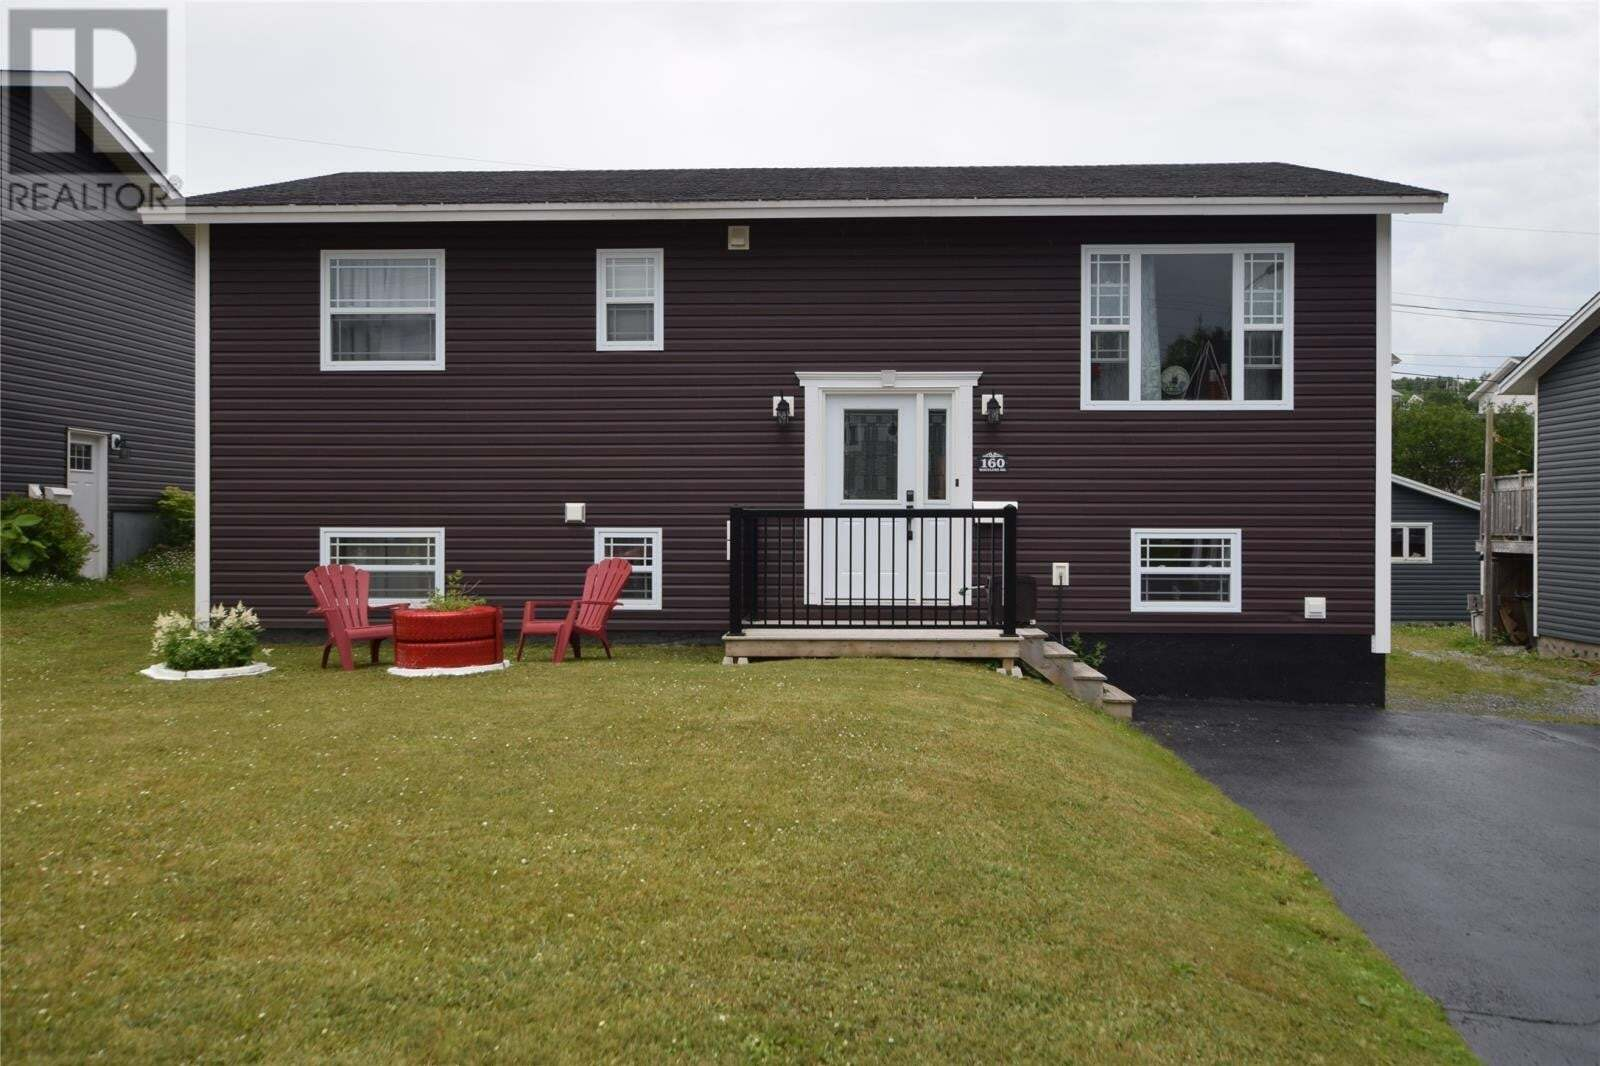 House for sale at 160 Wheelers Road Rd Corner Brook Newfoundland - MLS: 1218174